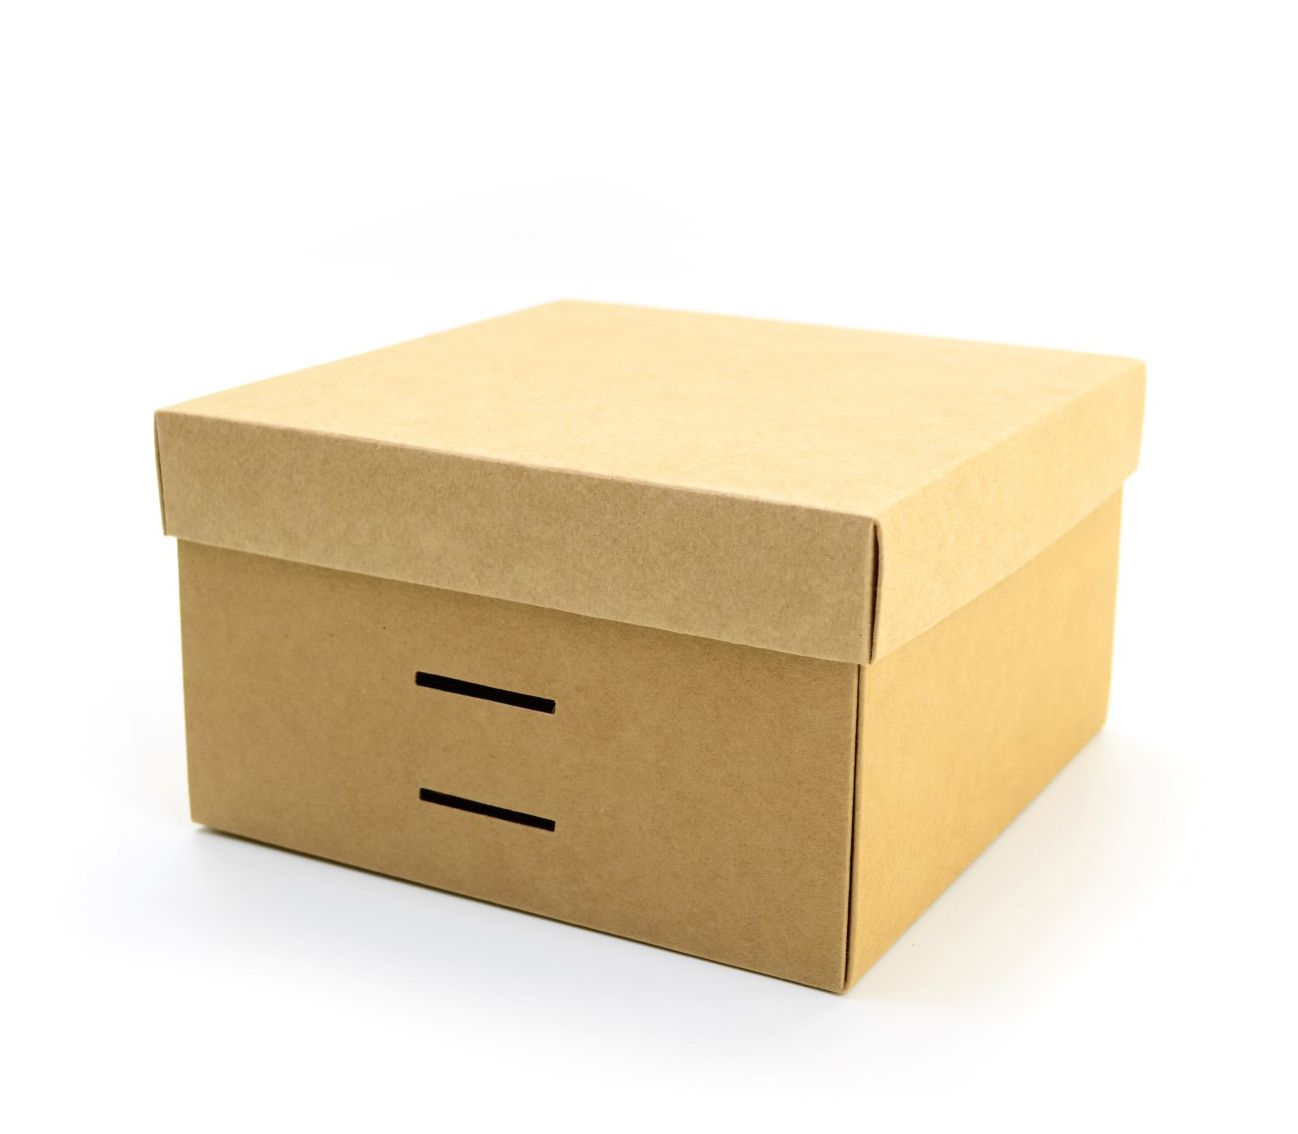 Ref 098 Kraft - Caixa c/ tampa papel e passa-fita - 17x17x10 cm - c/ 10 unidades